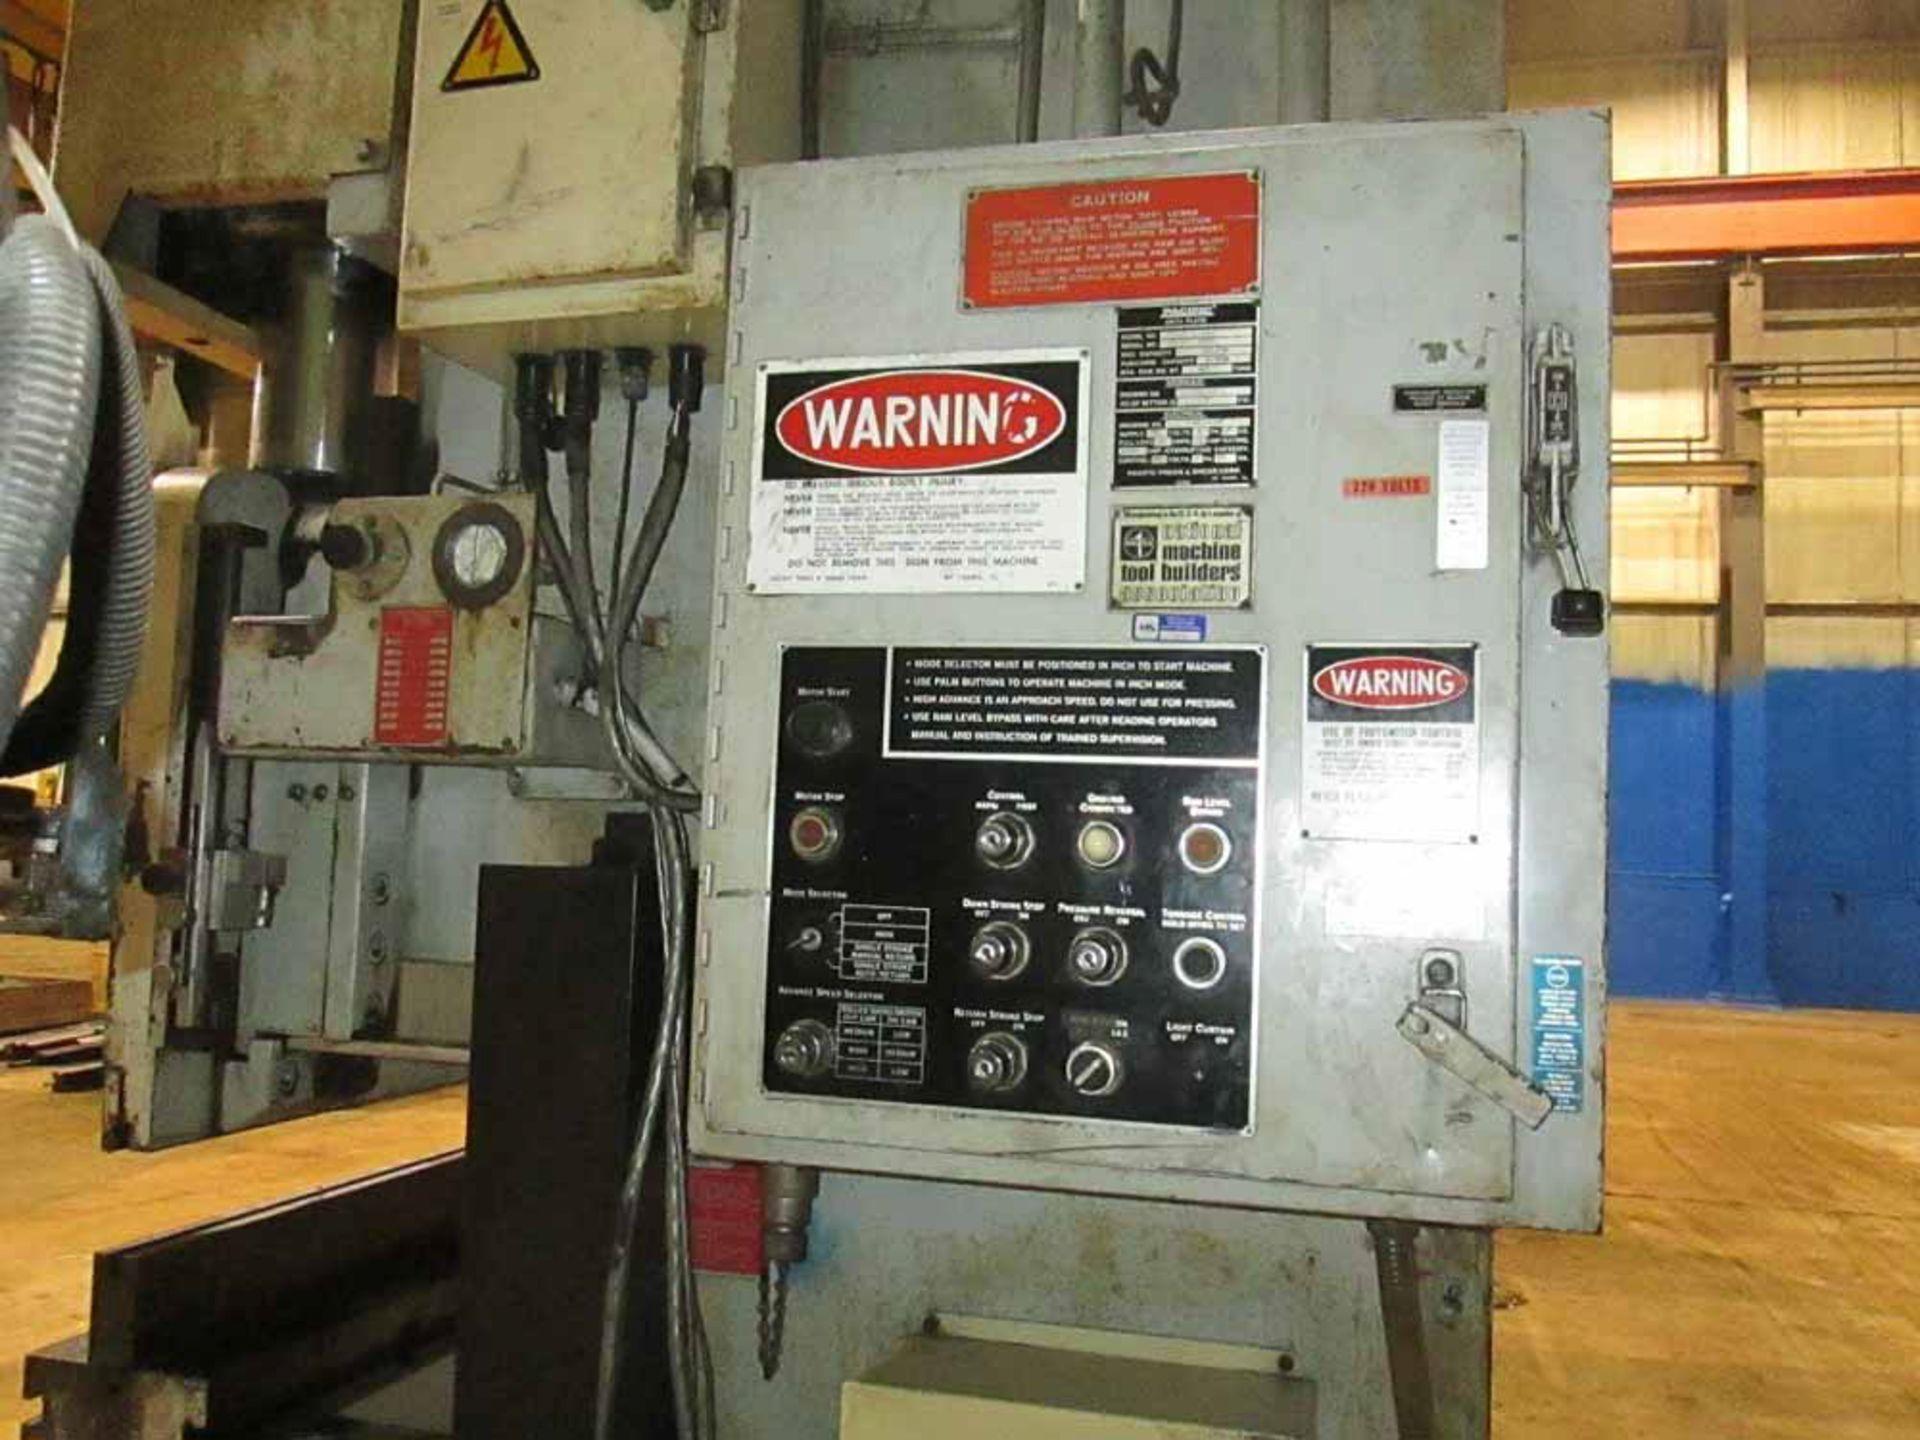 Lot 38 - 1986 Pacific CNC 2 Axis Hydraulic Press Brake   110-Ton x 12', Mdl: J110-12, S/N: 9999 - 6426P